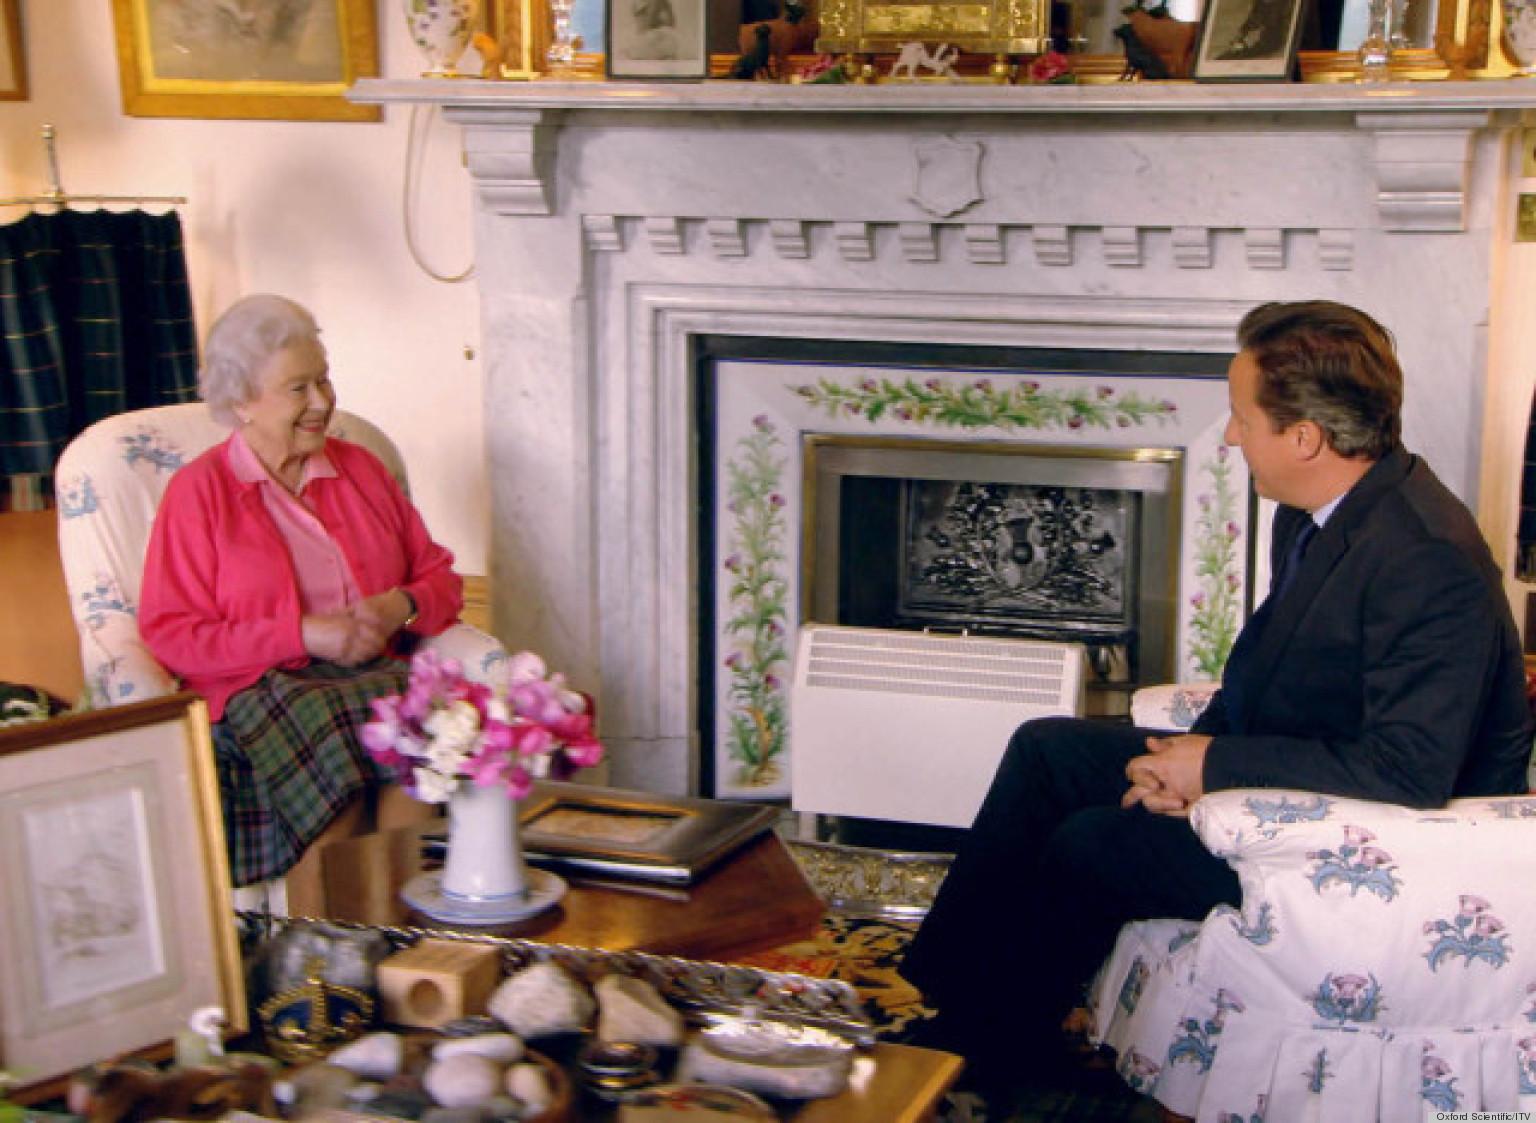 Queen Elizabeth Ii S Private Sitting Room In Balmoral